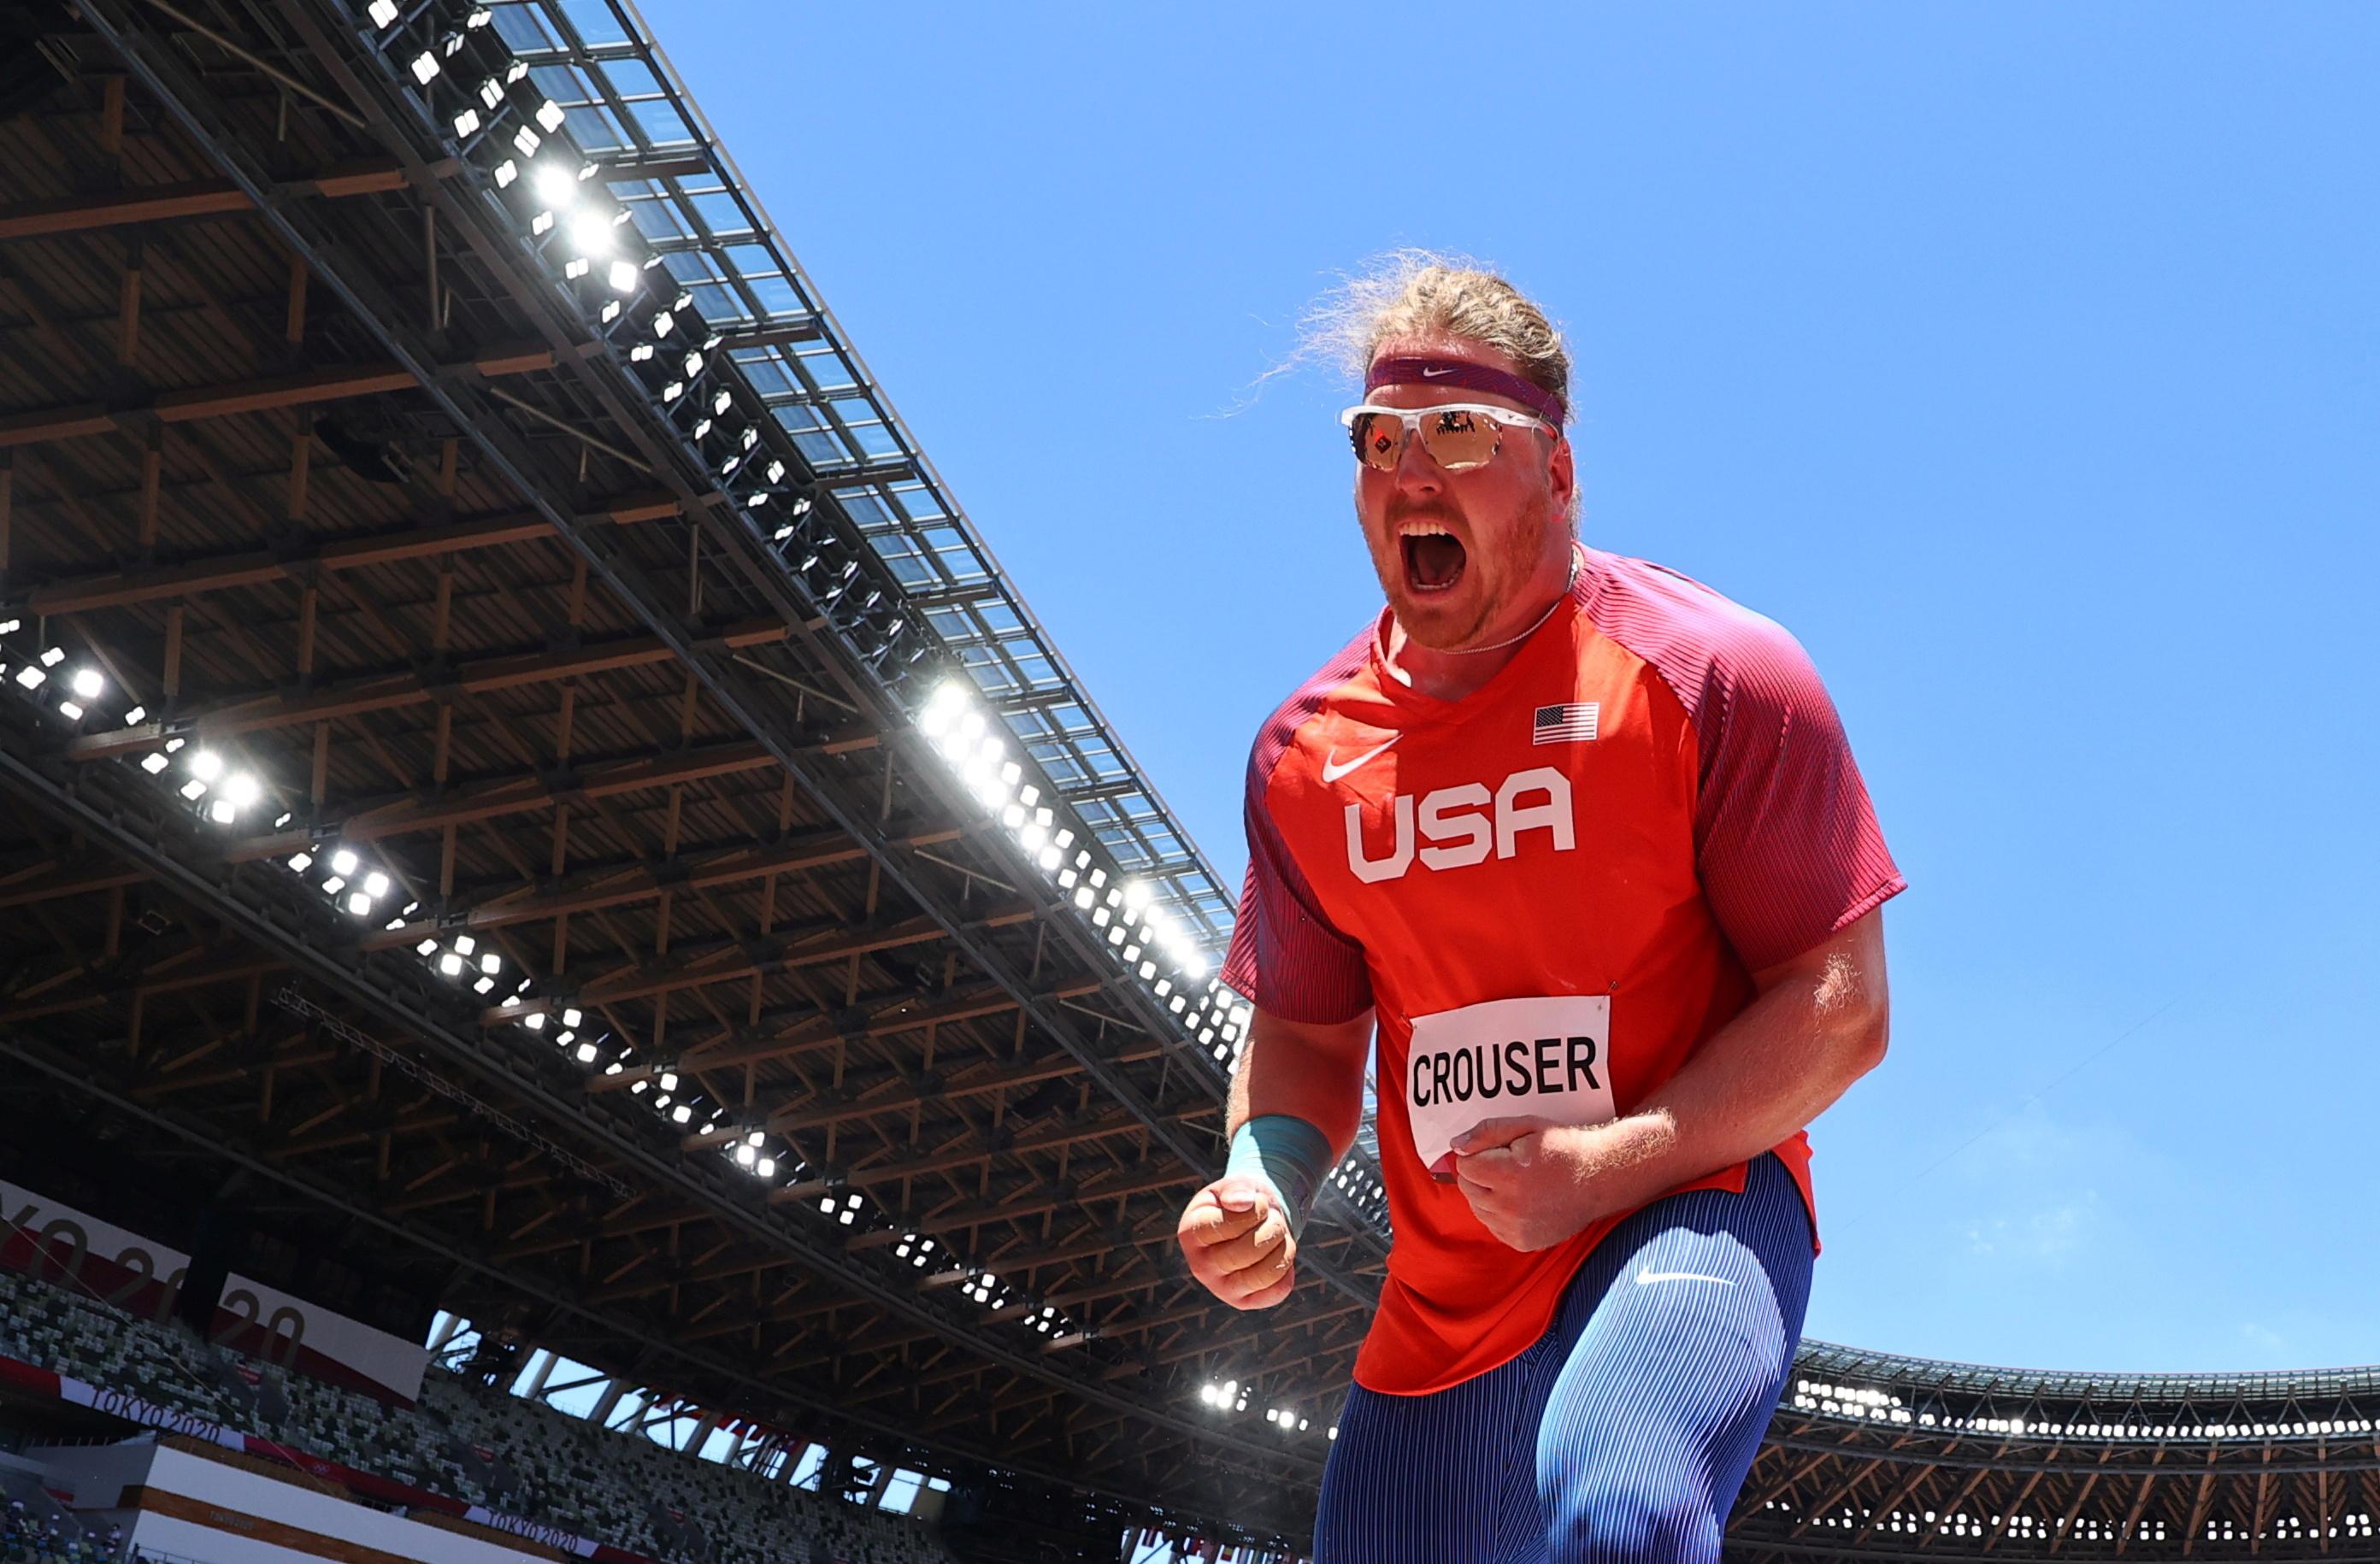 Tokyo 2020 Olympics - Athletics - Men's Shot Put - Final - Olympic Stadium, Tokyo, Japan - August 5, 2021. Ryan Crouser of the United States celebrates after his throw REUTERS/Kai Pfaffenbach